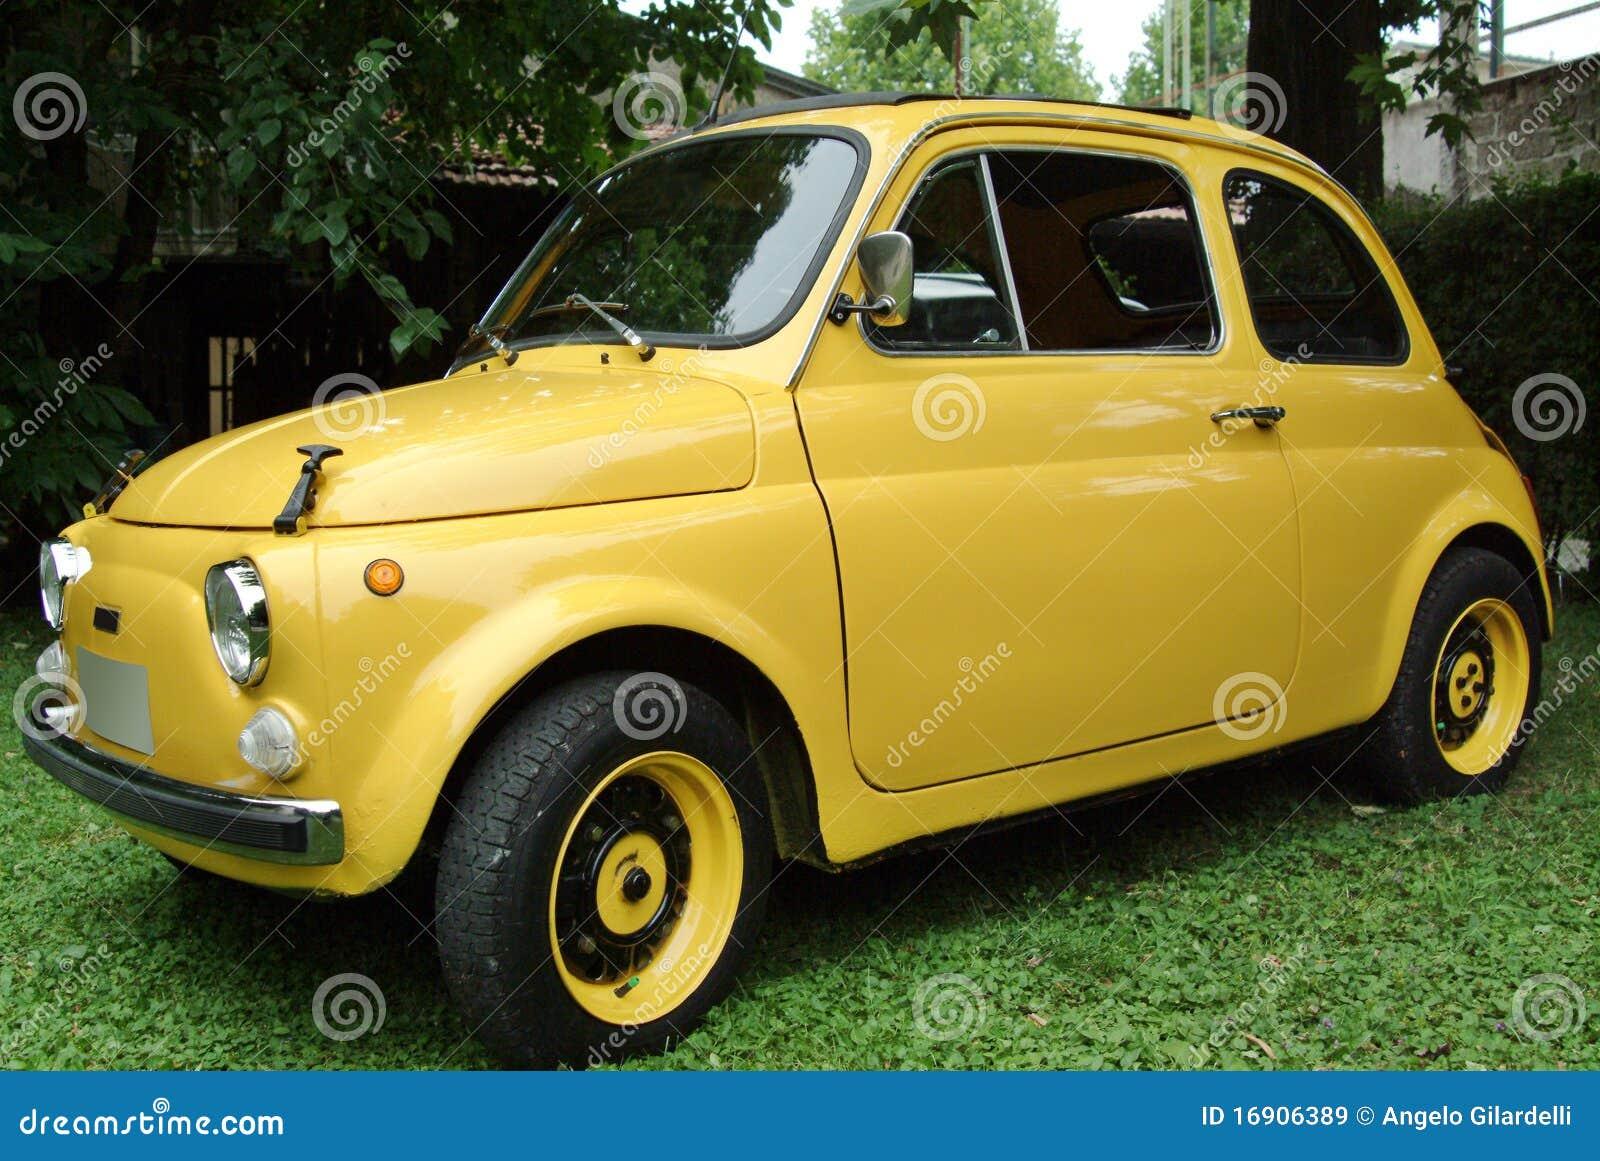 fiat 500 italian car stock image image of vintage street 16906389. Black Bedroom Furniture Sets. Home Design Ideas